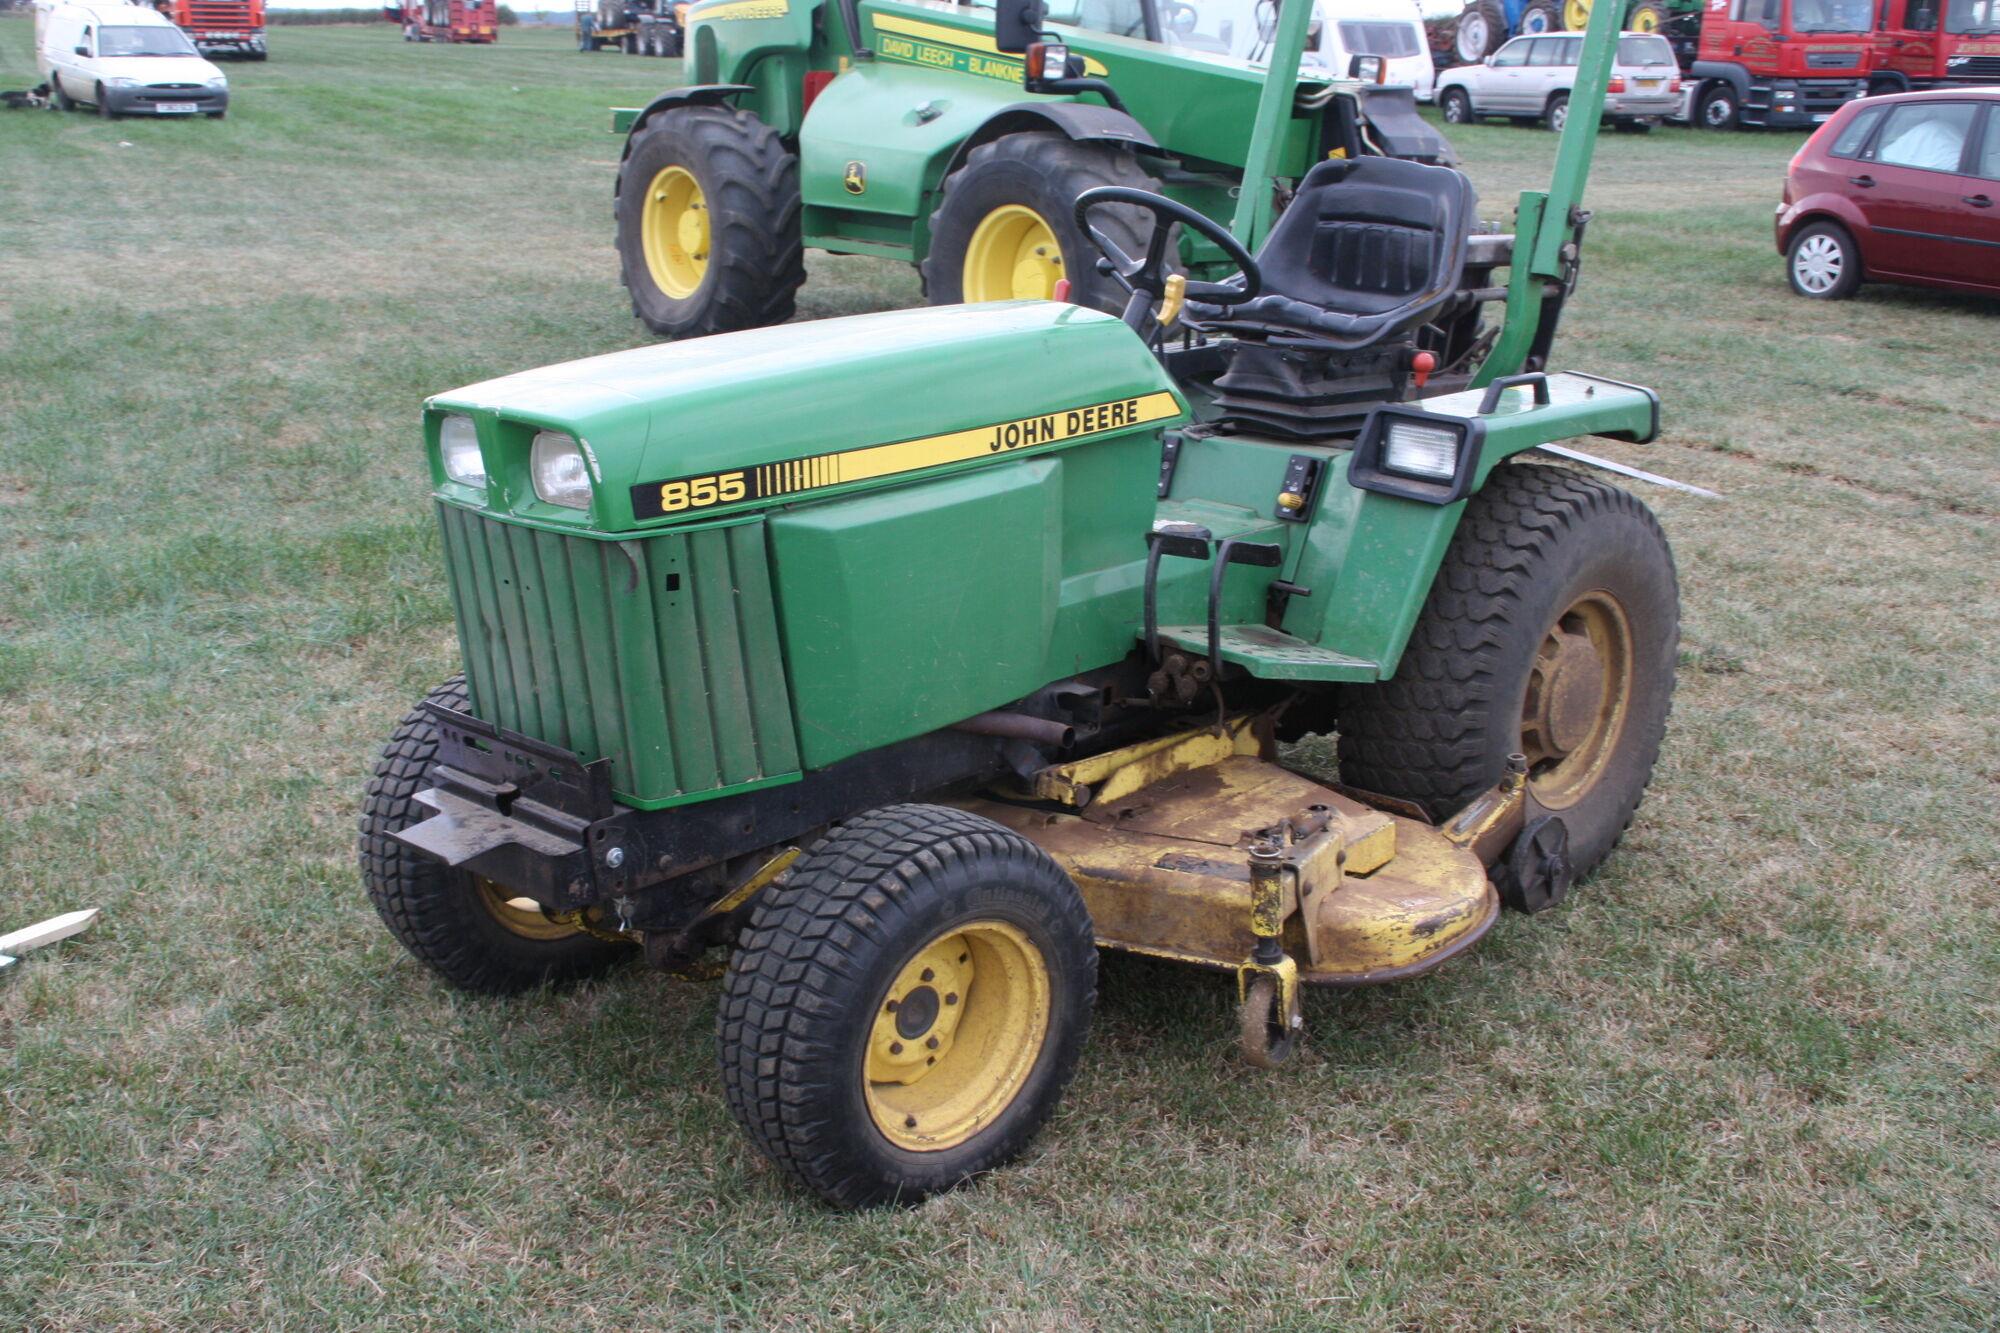 John Deere 855 | Tractor & Construction Plant Wiki ...